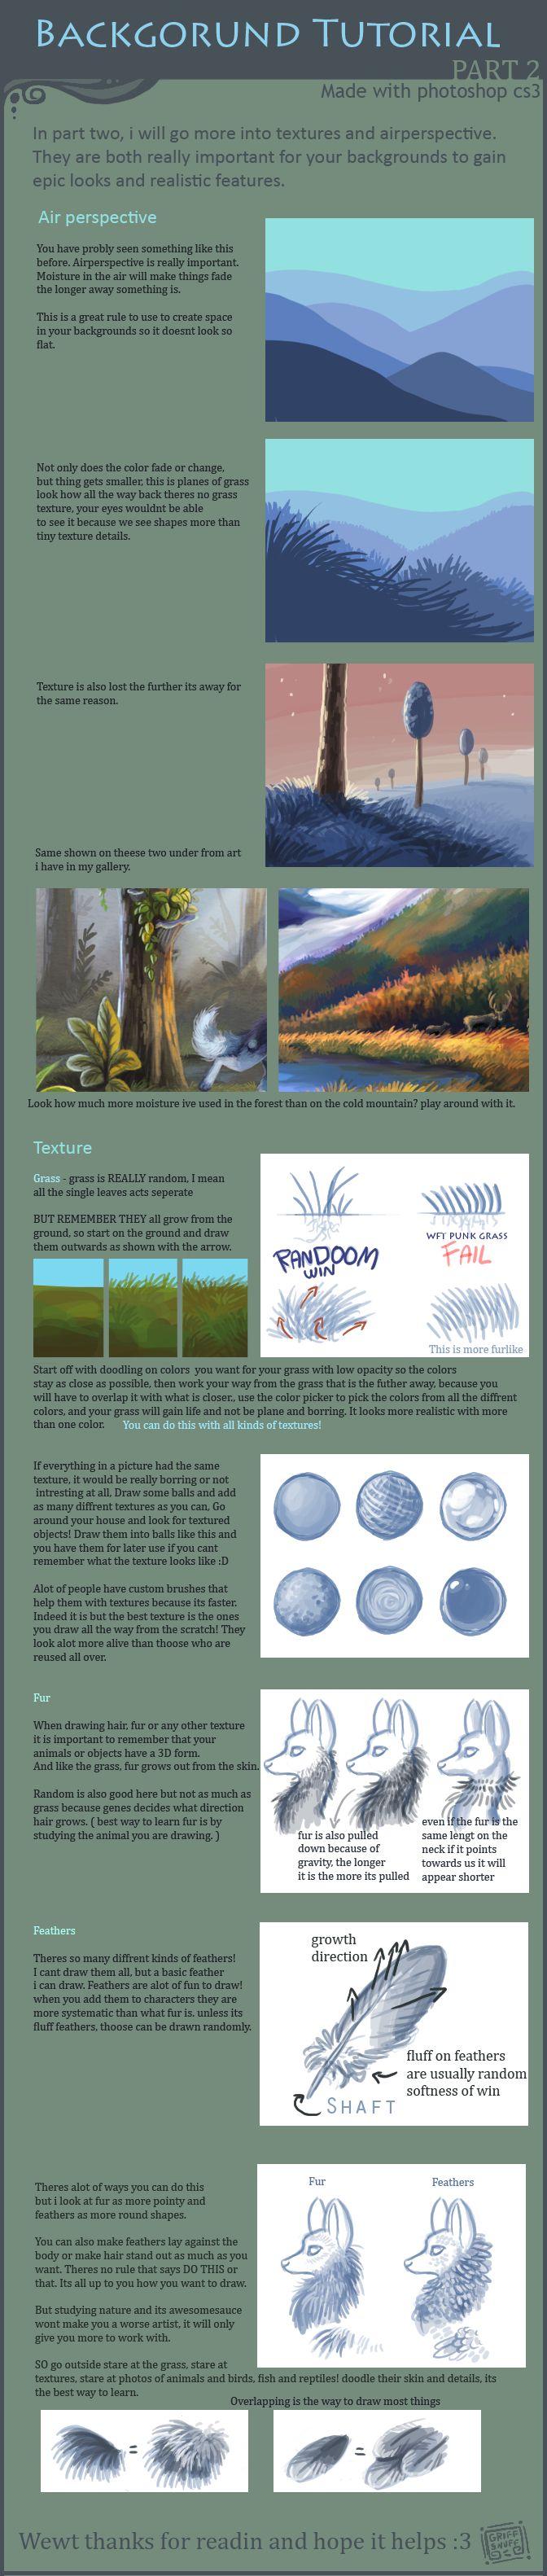 Background tutorial part 2 by =griffsnuff